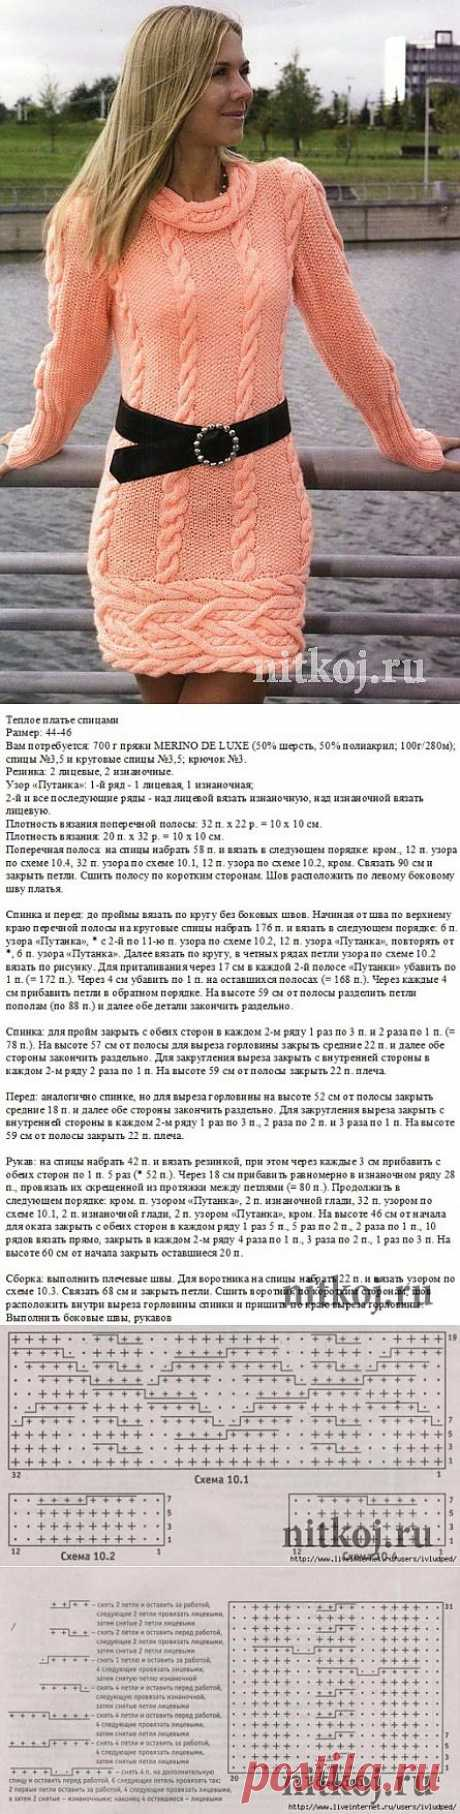 Владимир Svarnoy: Привет, Алена! Добро пожаловат…